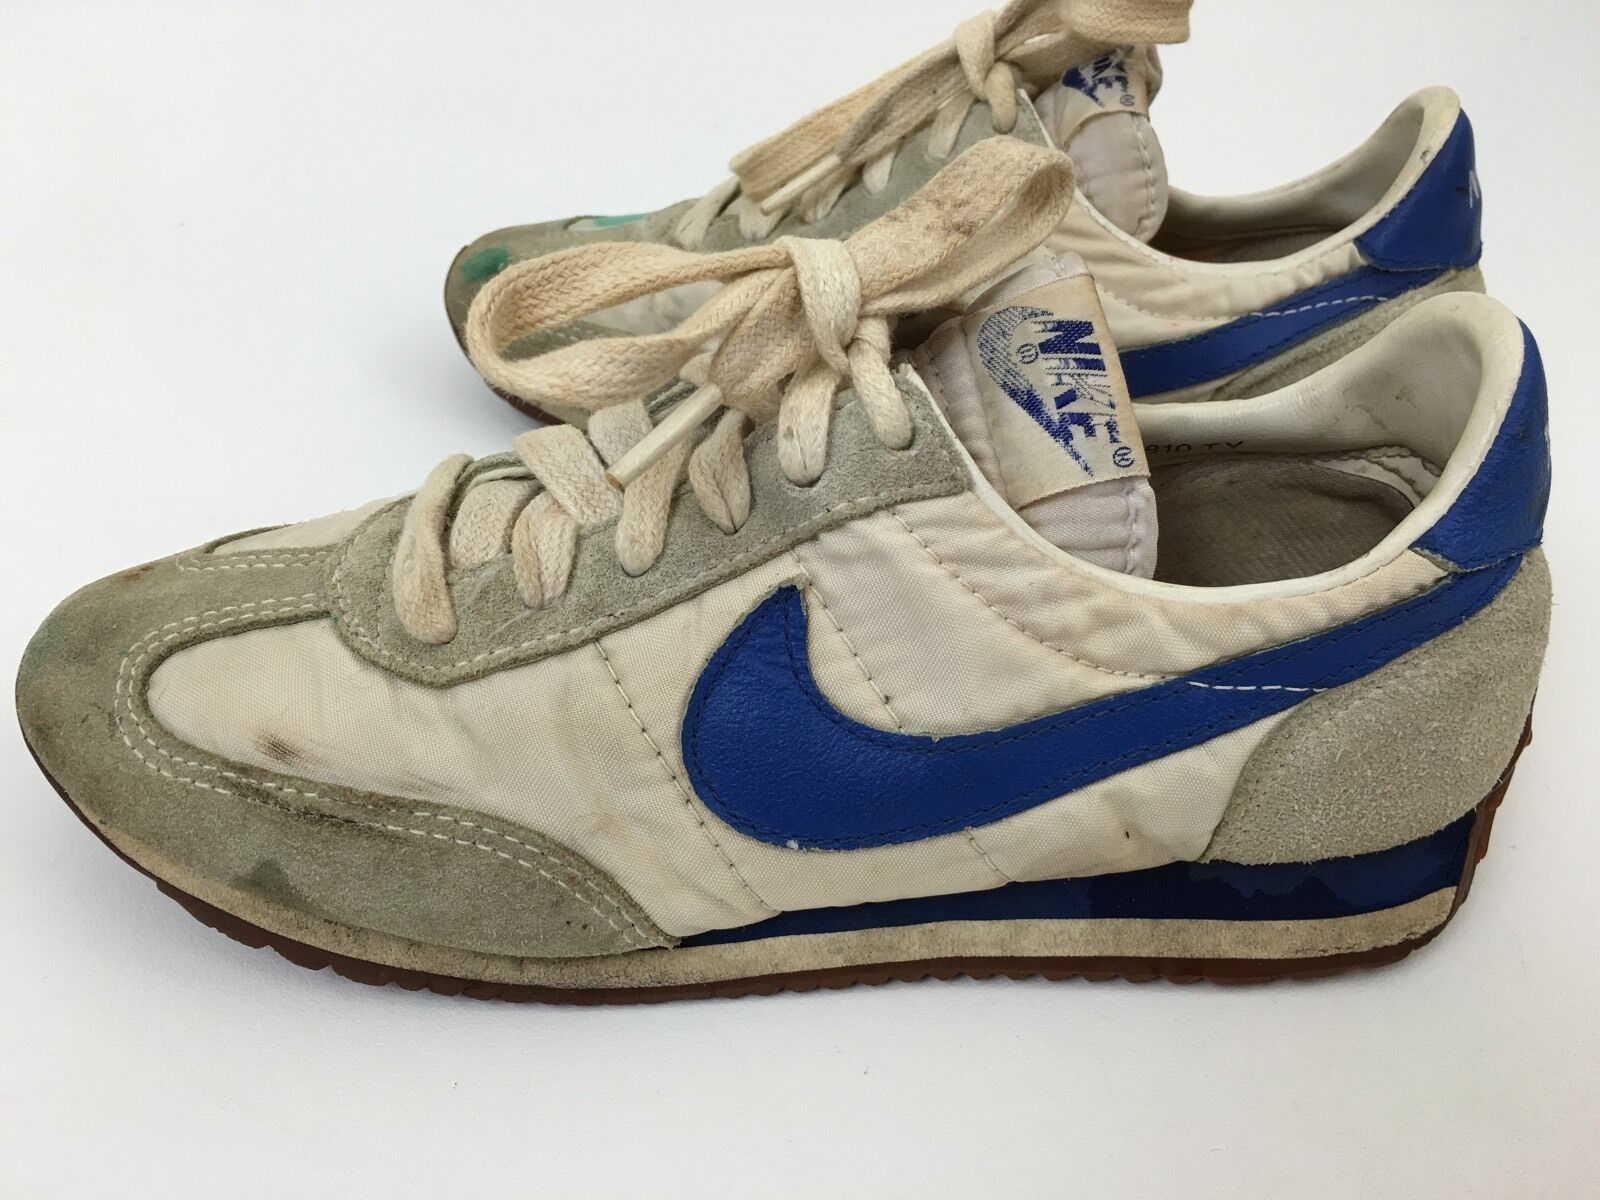 Vintage NIKE Sneakers Suede Leather Upper Blue Swoosh logo Comfortable